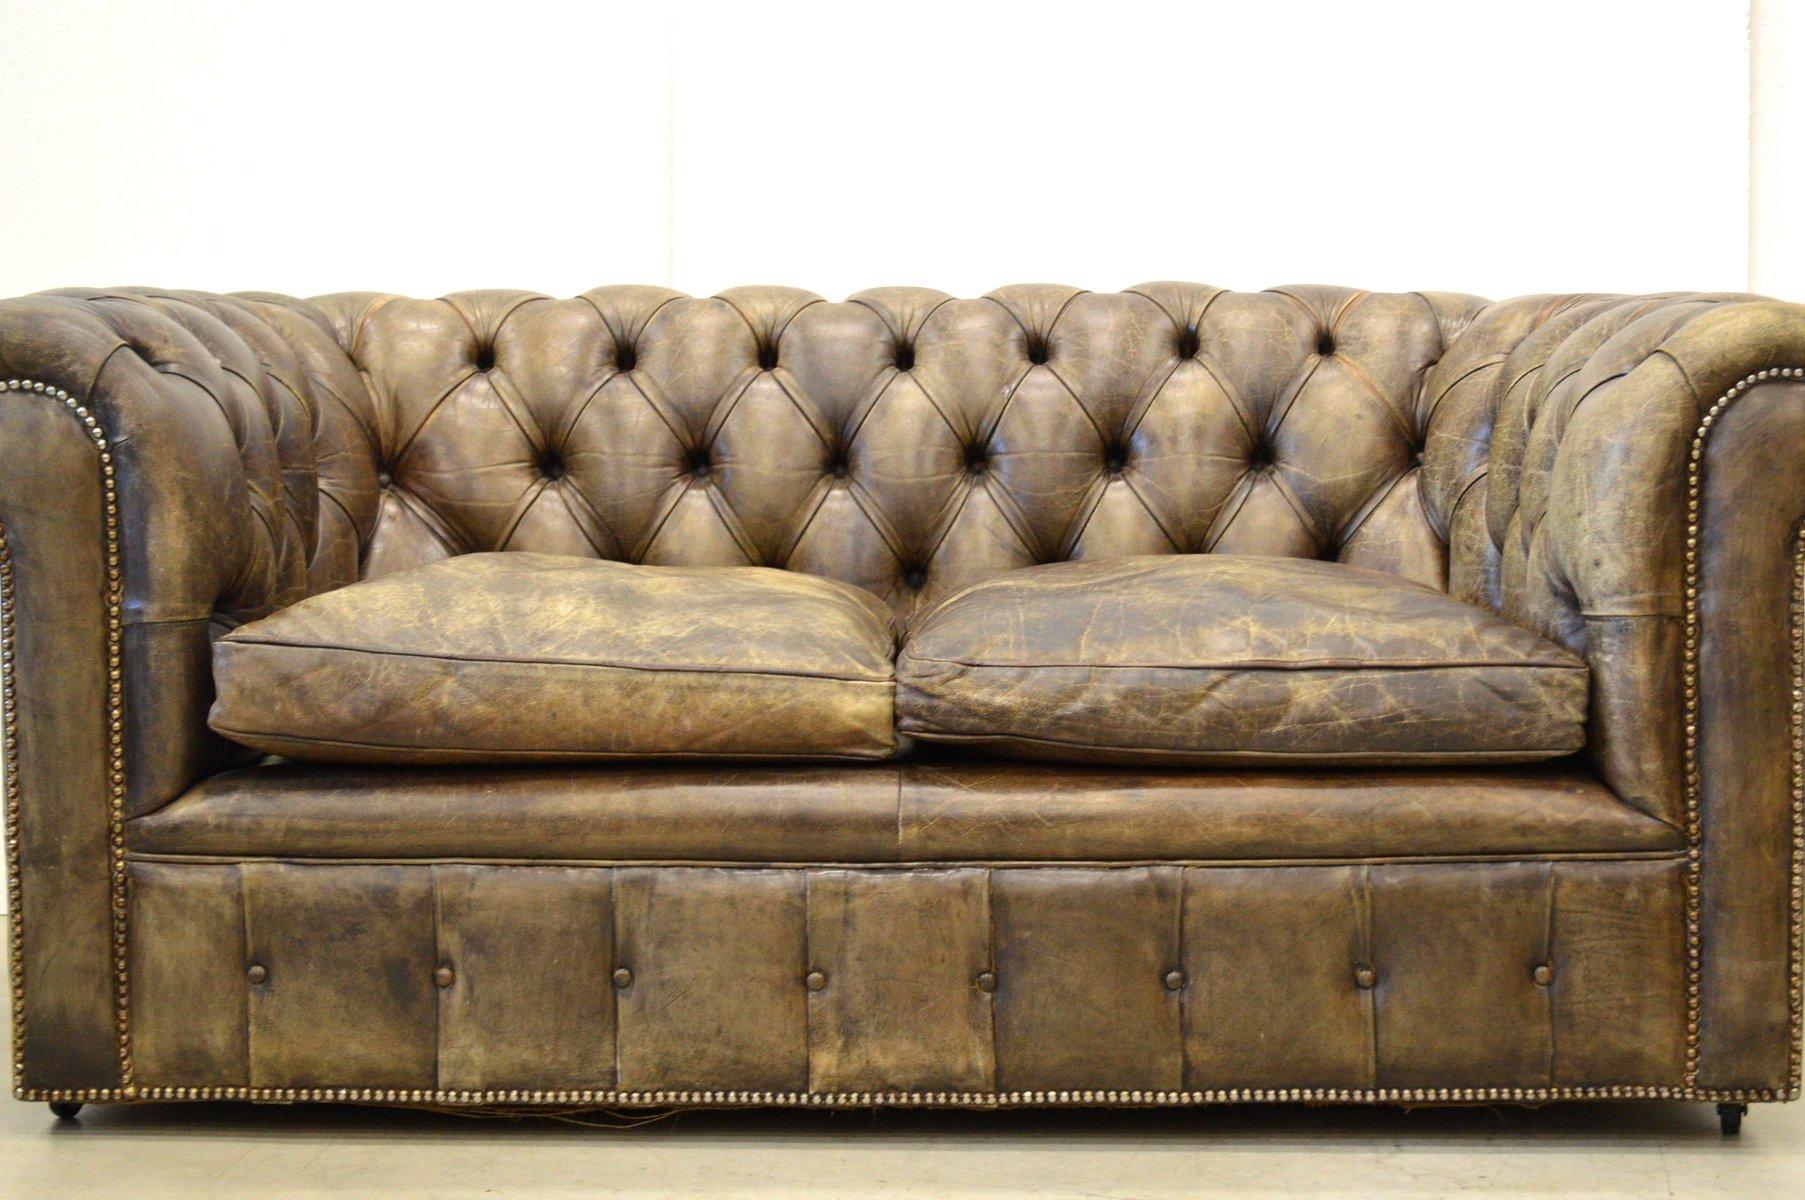 vintage leather chesterfield sofa home sofa rh homesofa2017 blogspot com